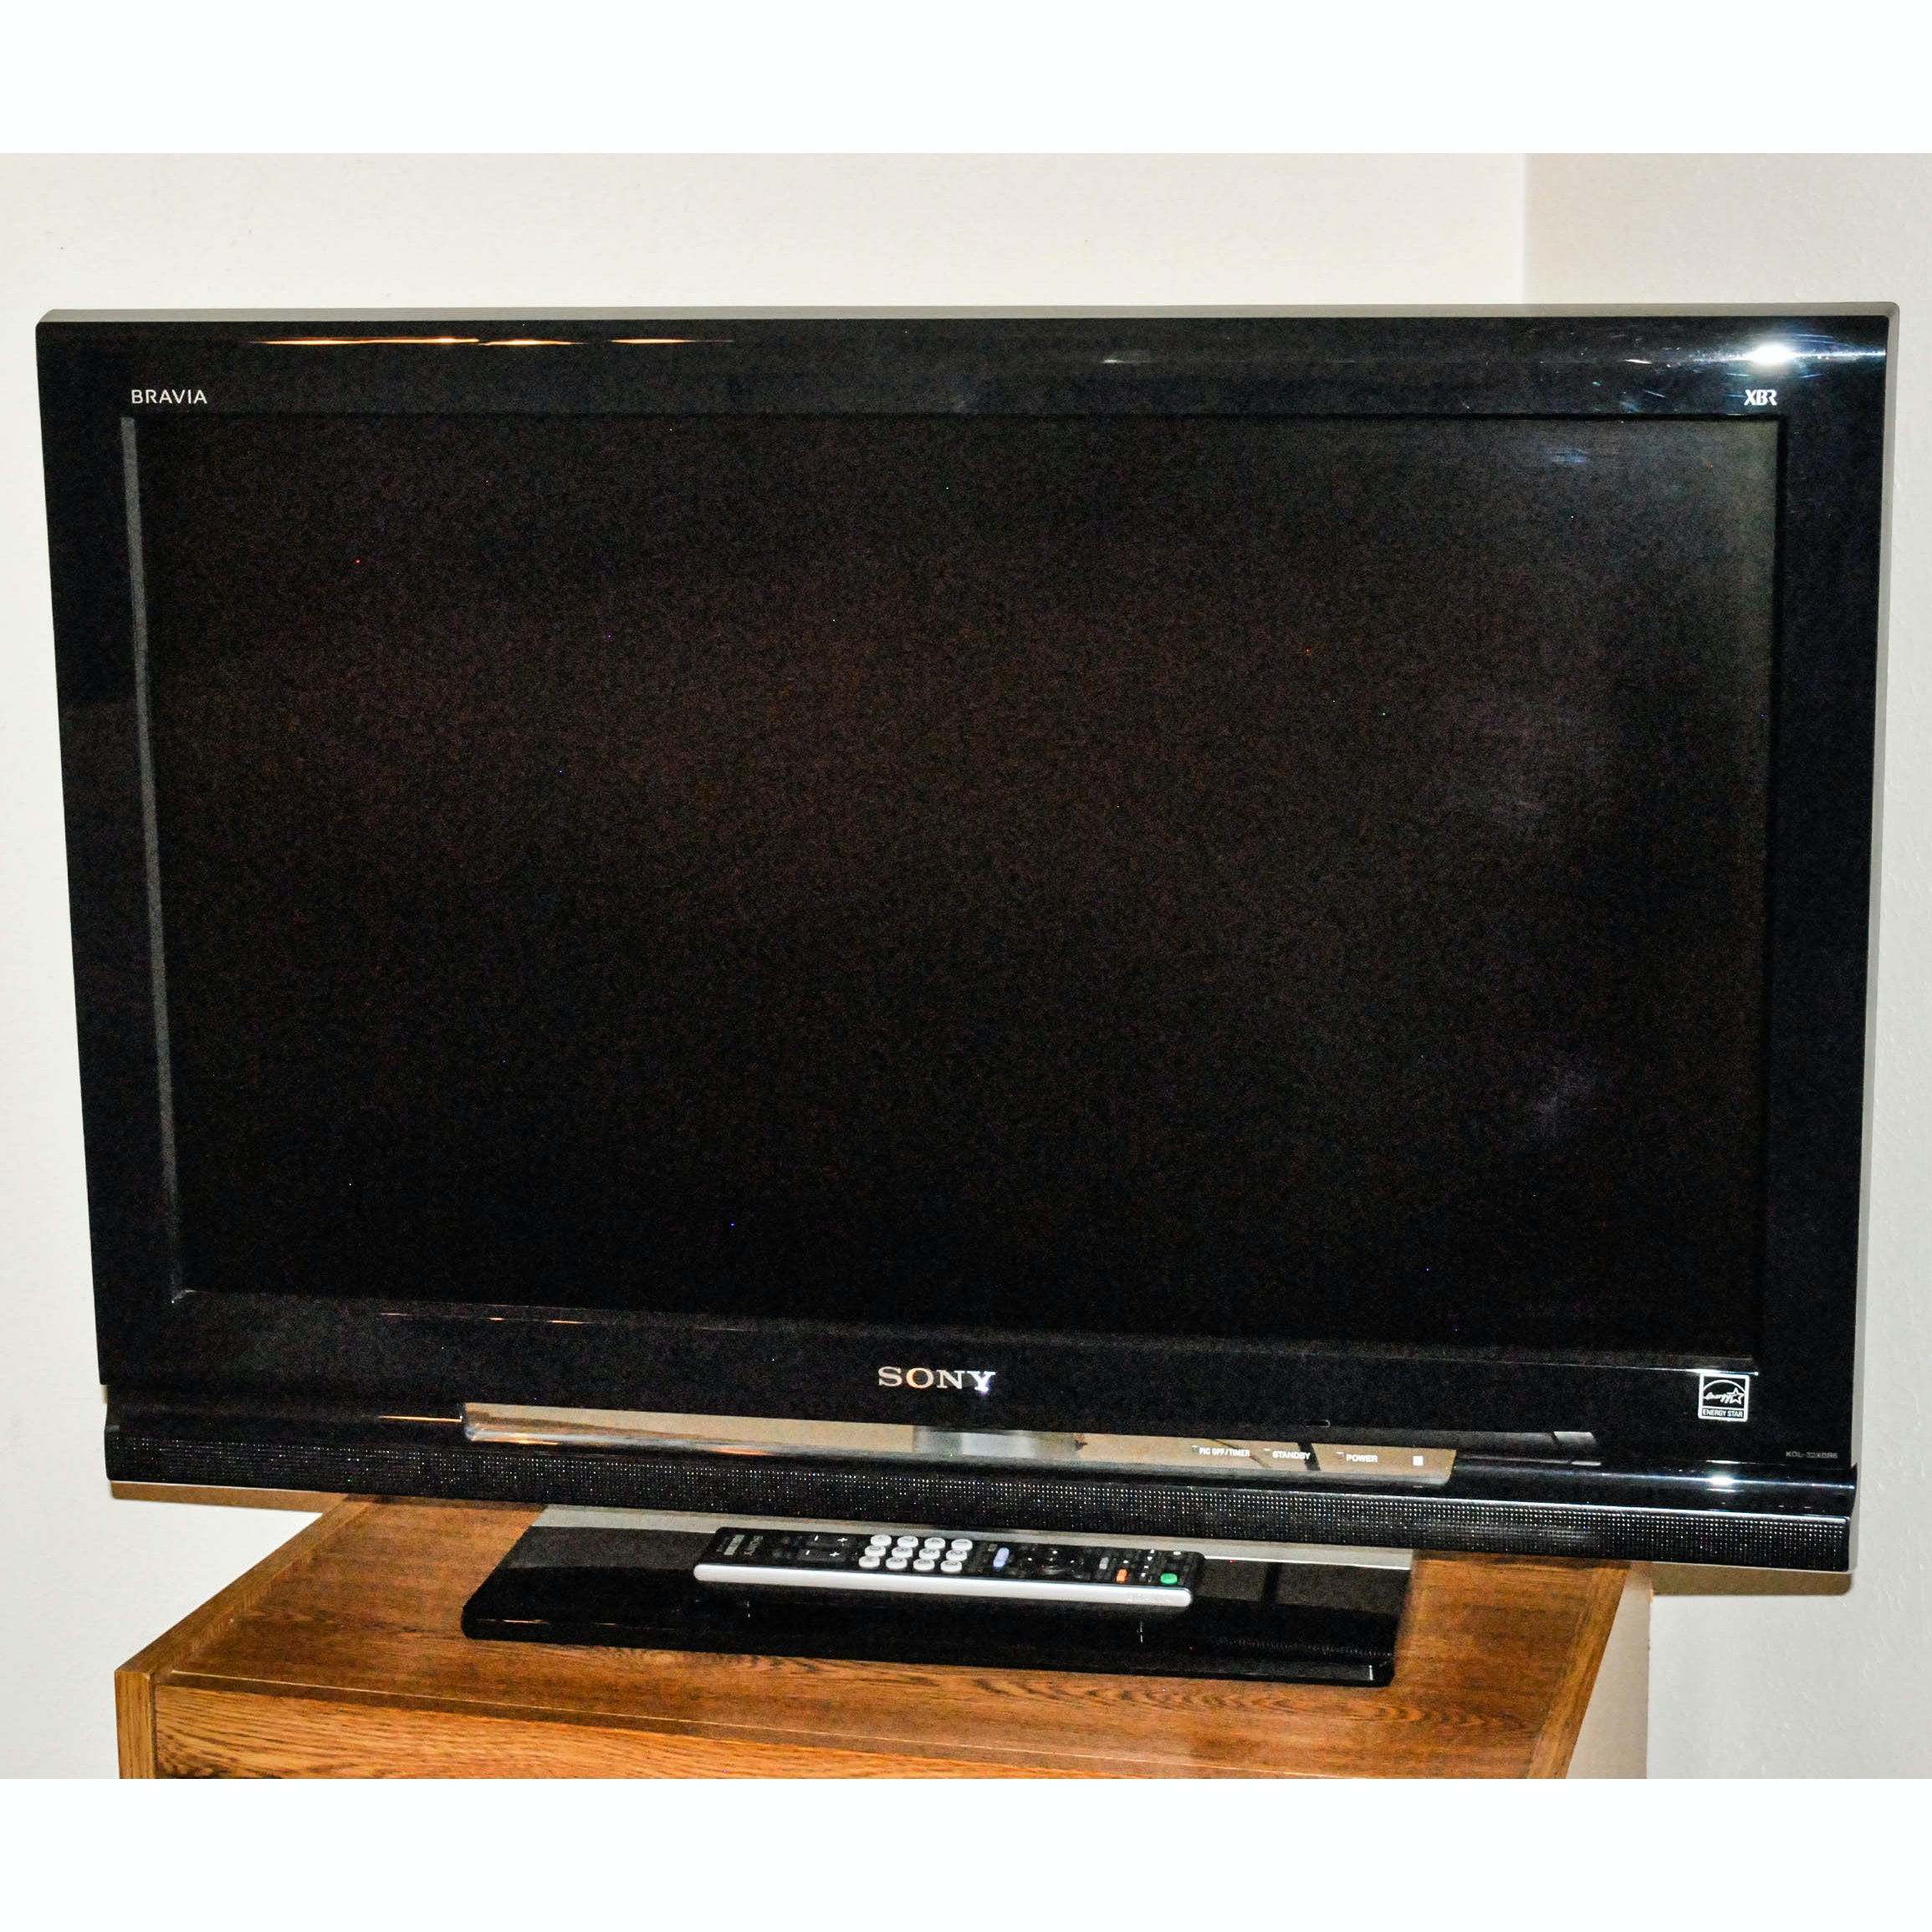 "Sony 32"" Bravia LCD Television"